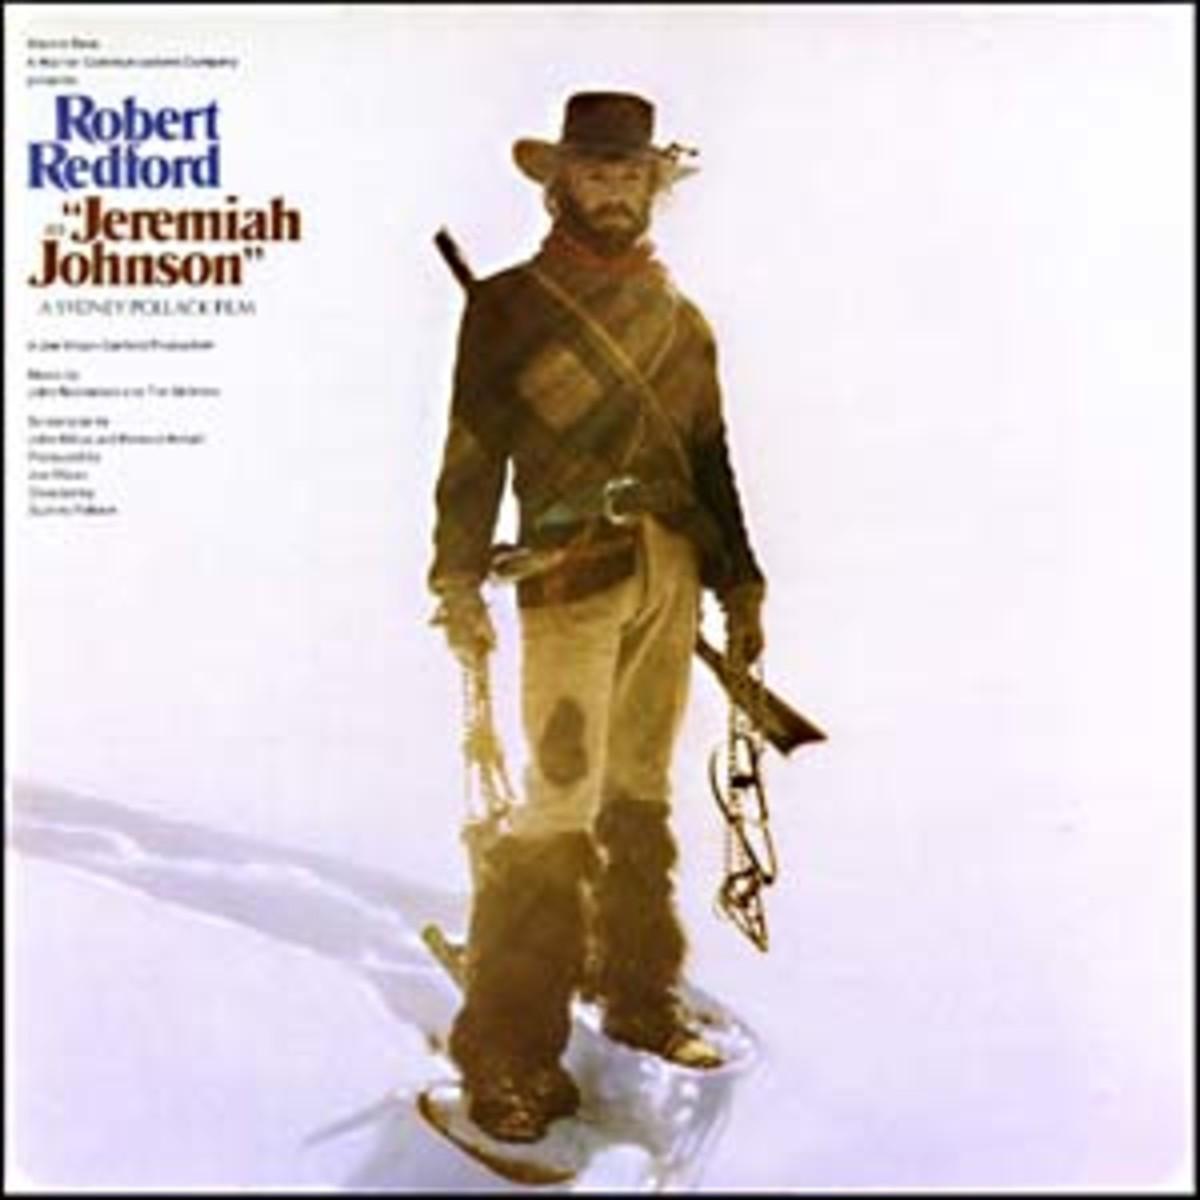 Robert Redford as Jerimiah Johnson